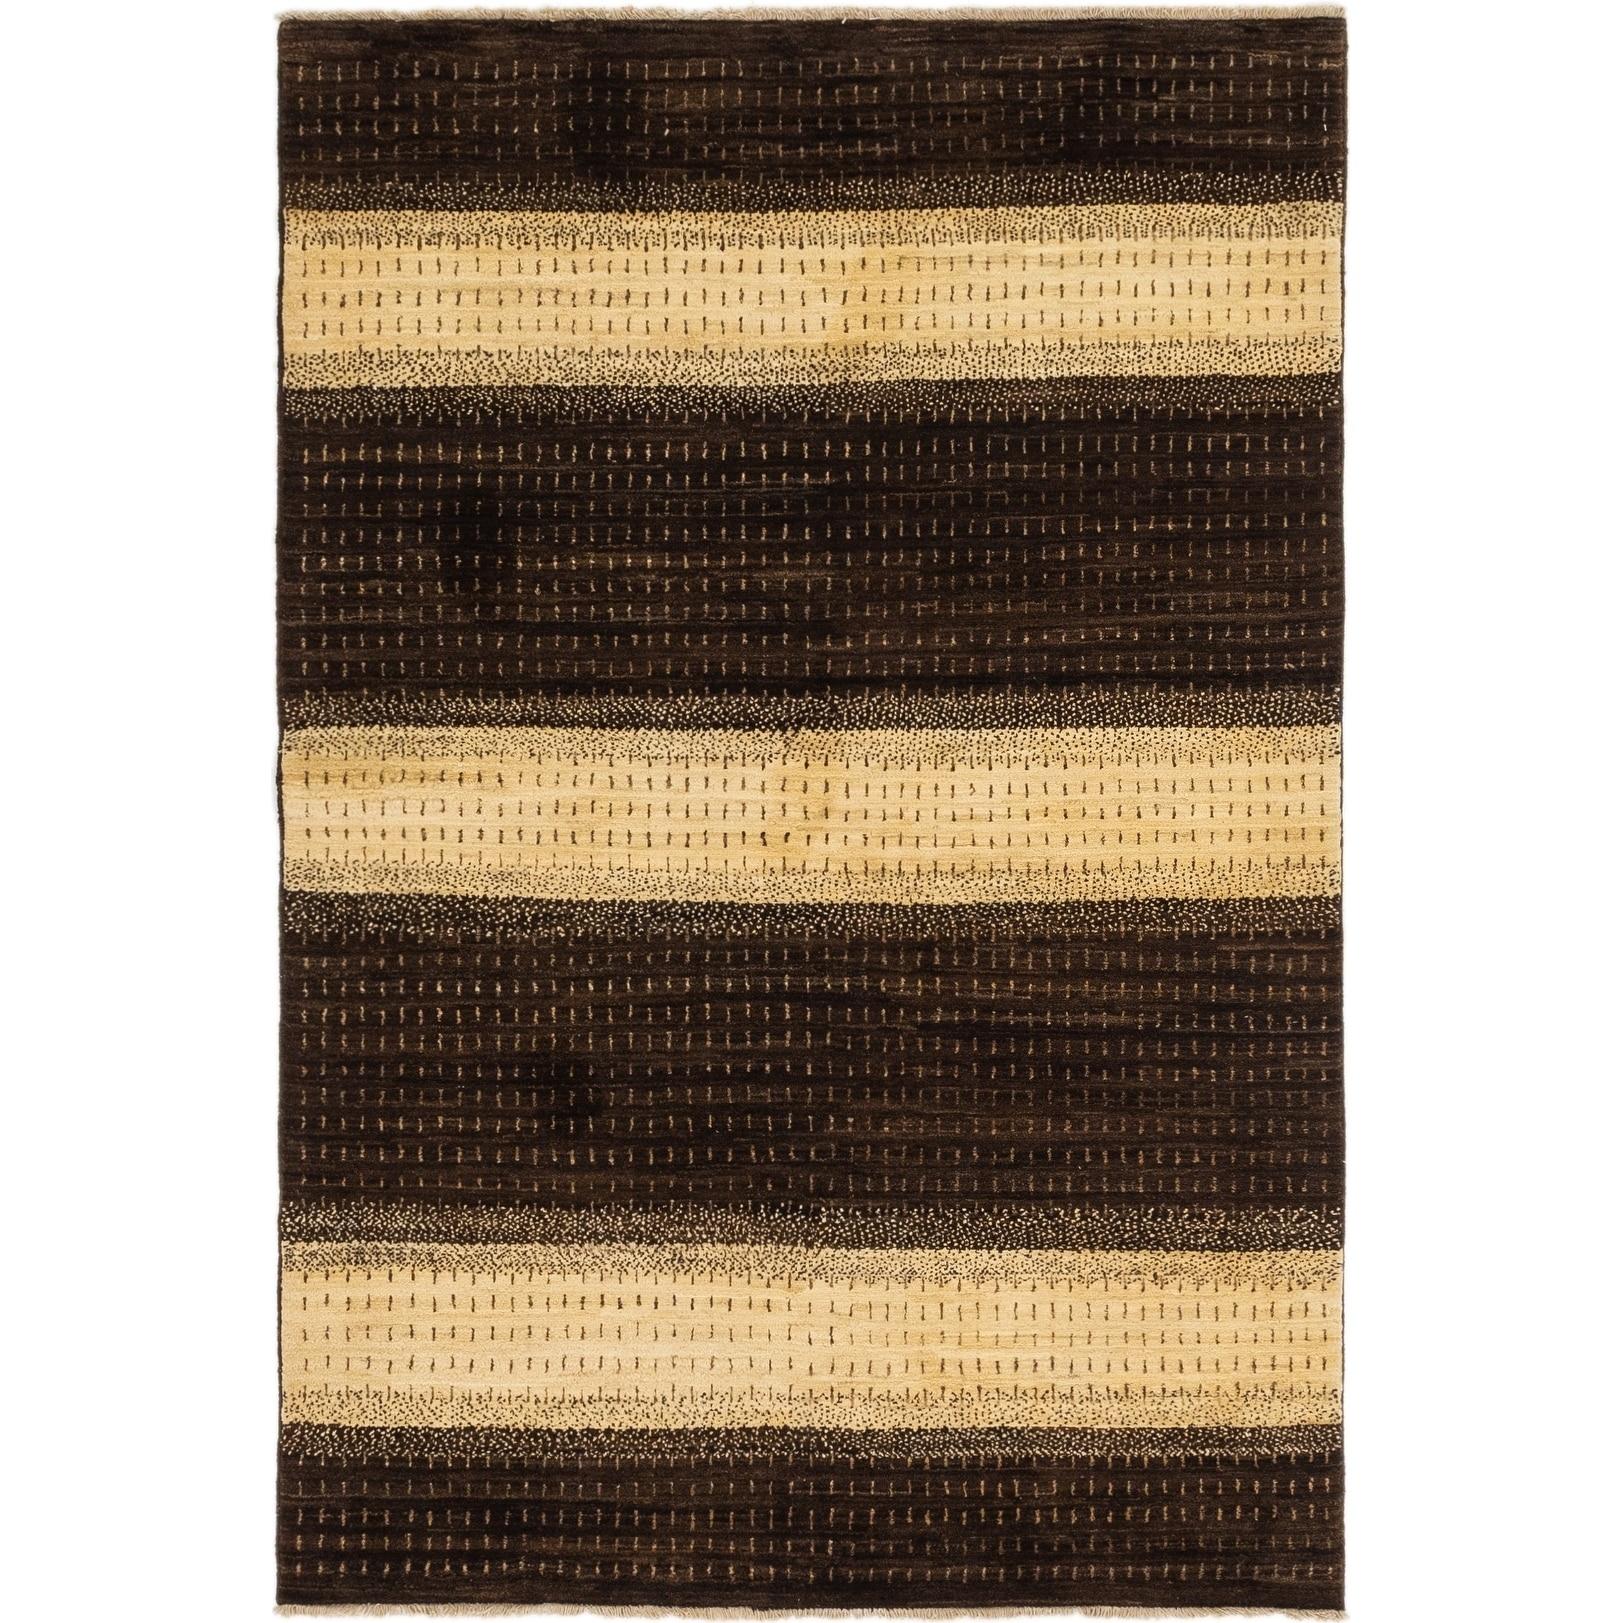 Hand Knotted Kashkuli Gabbeh Wool Area Rug - 5 x 7 3 (Brown - 5 x 7 3)